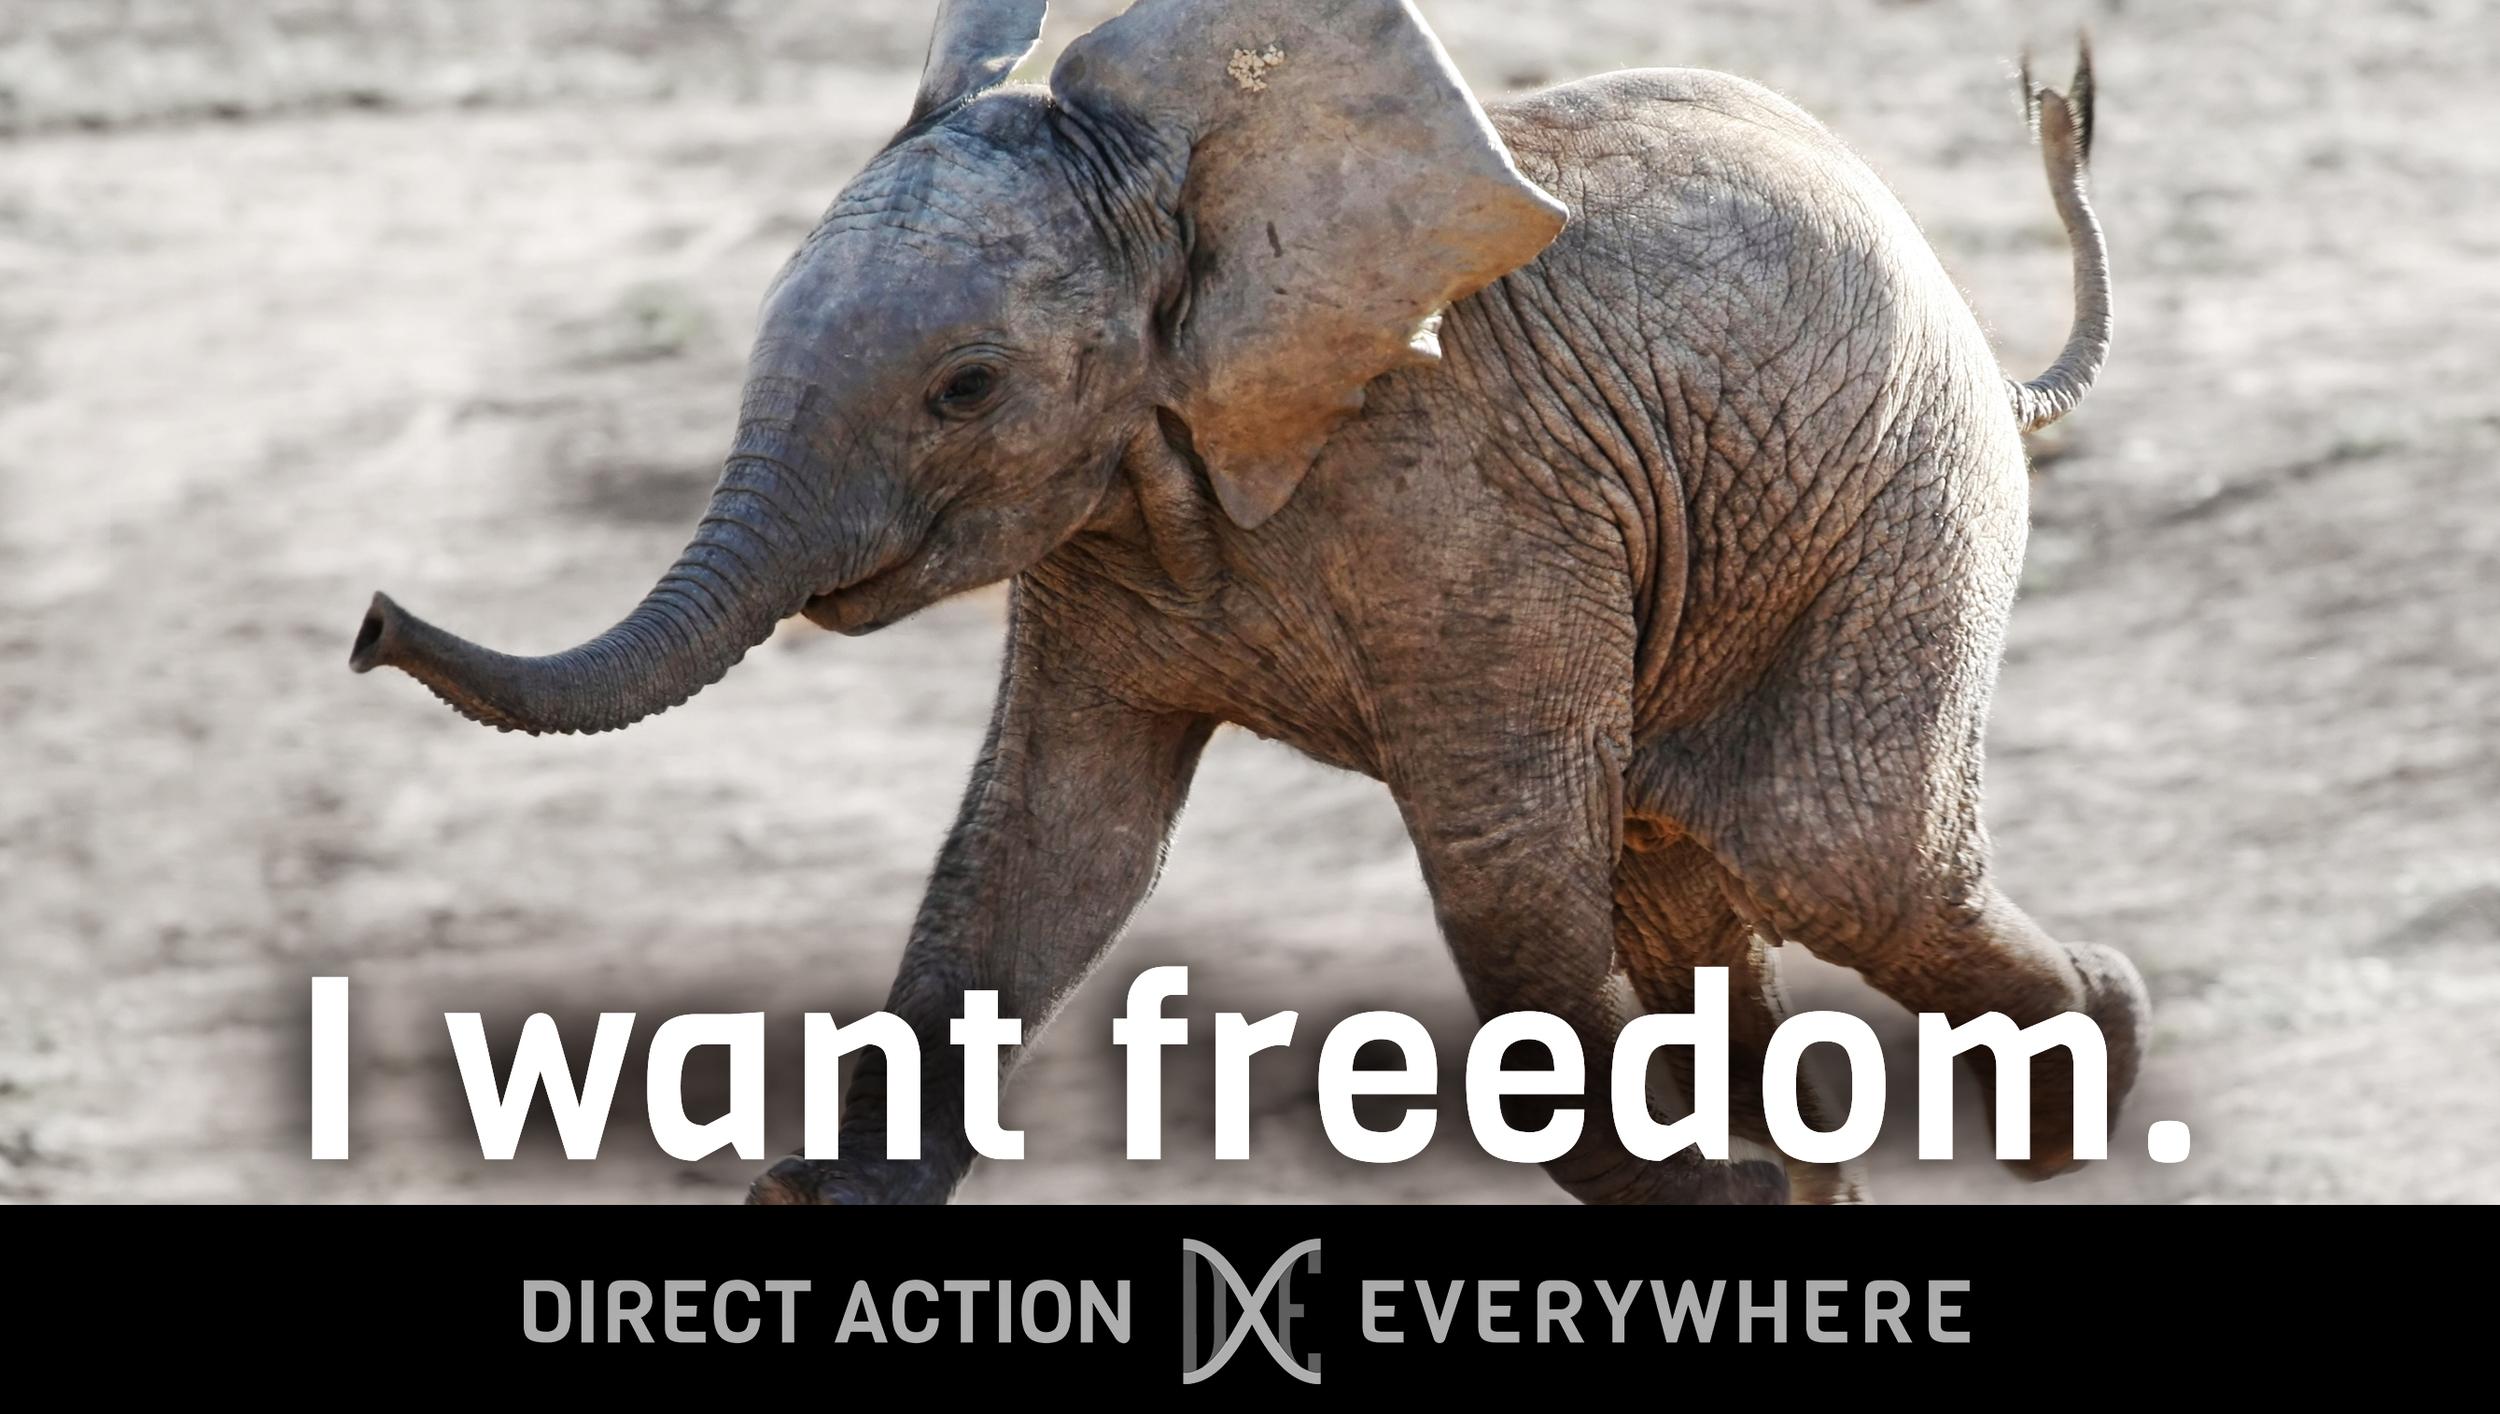 iwantfreedom_elephantbaby.jpg